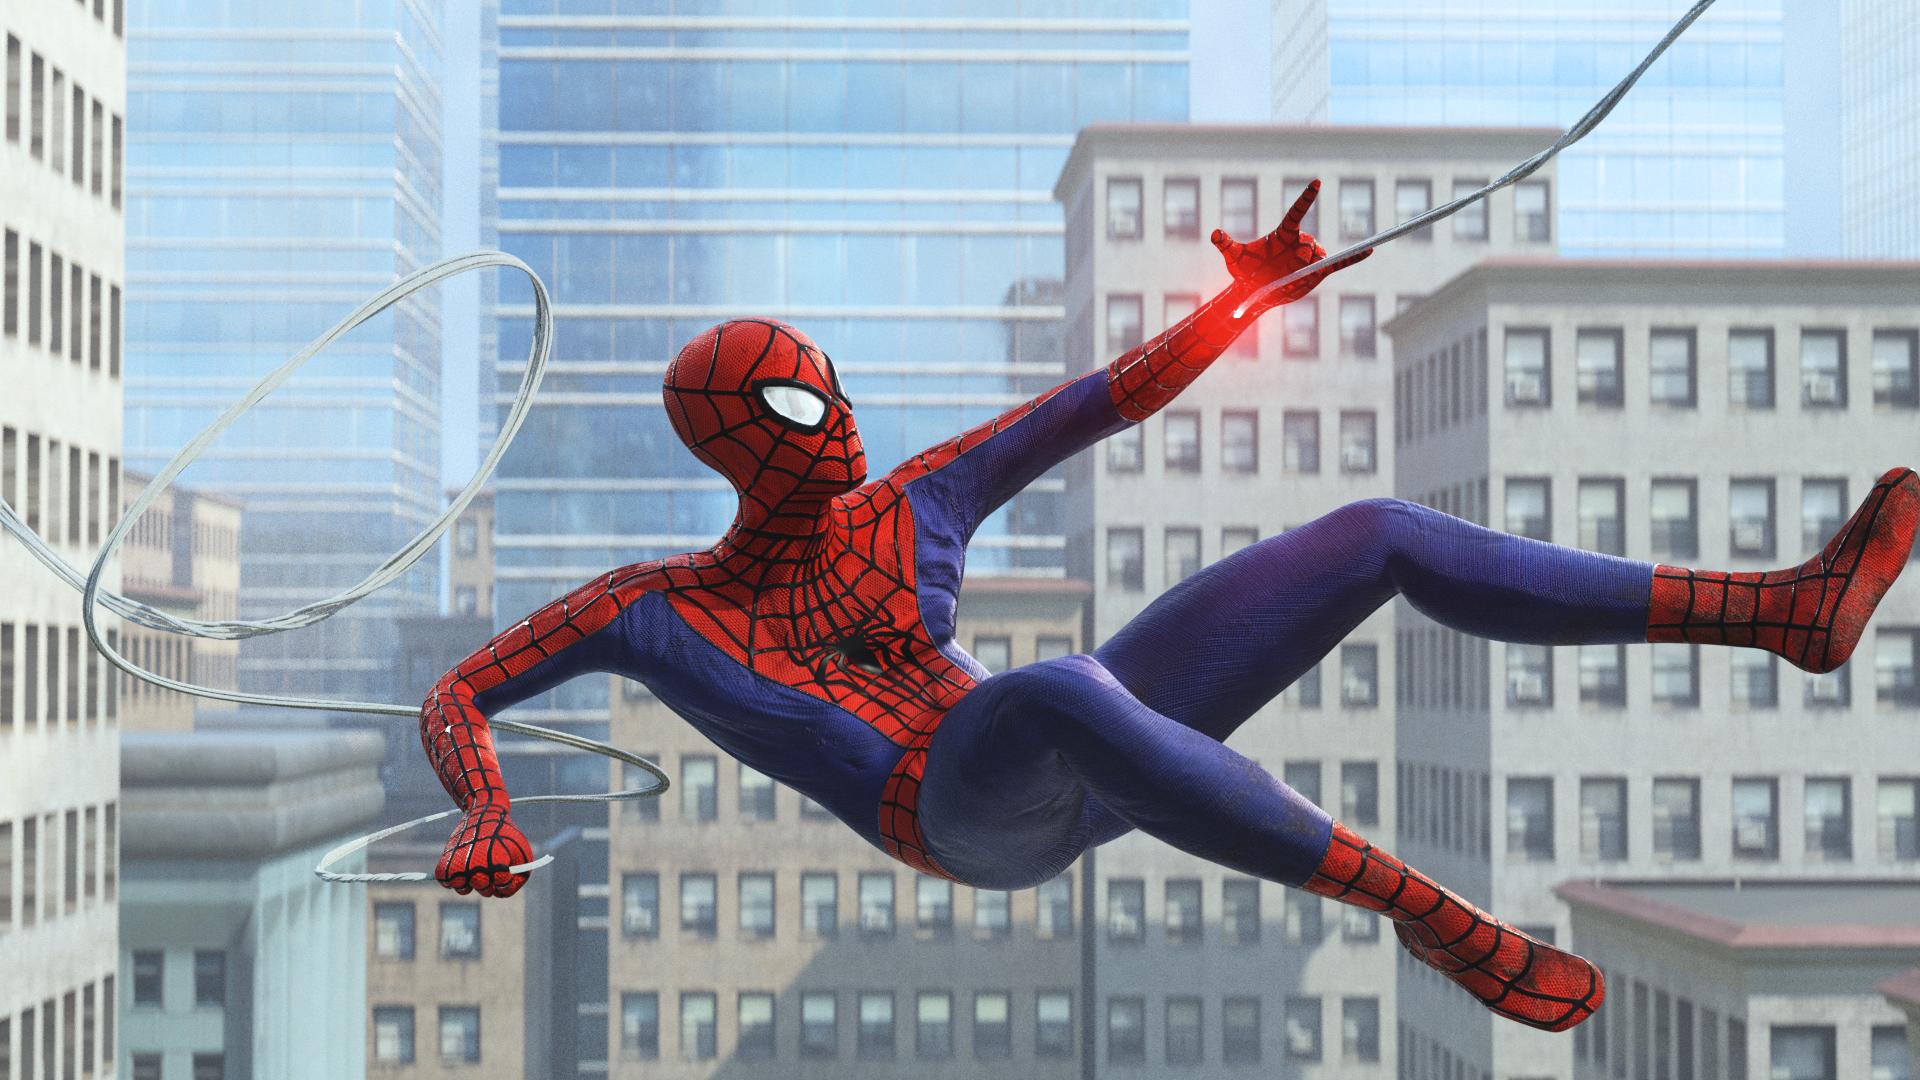 th amazing spider guy :)